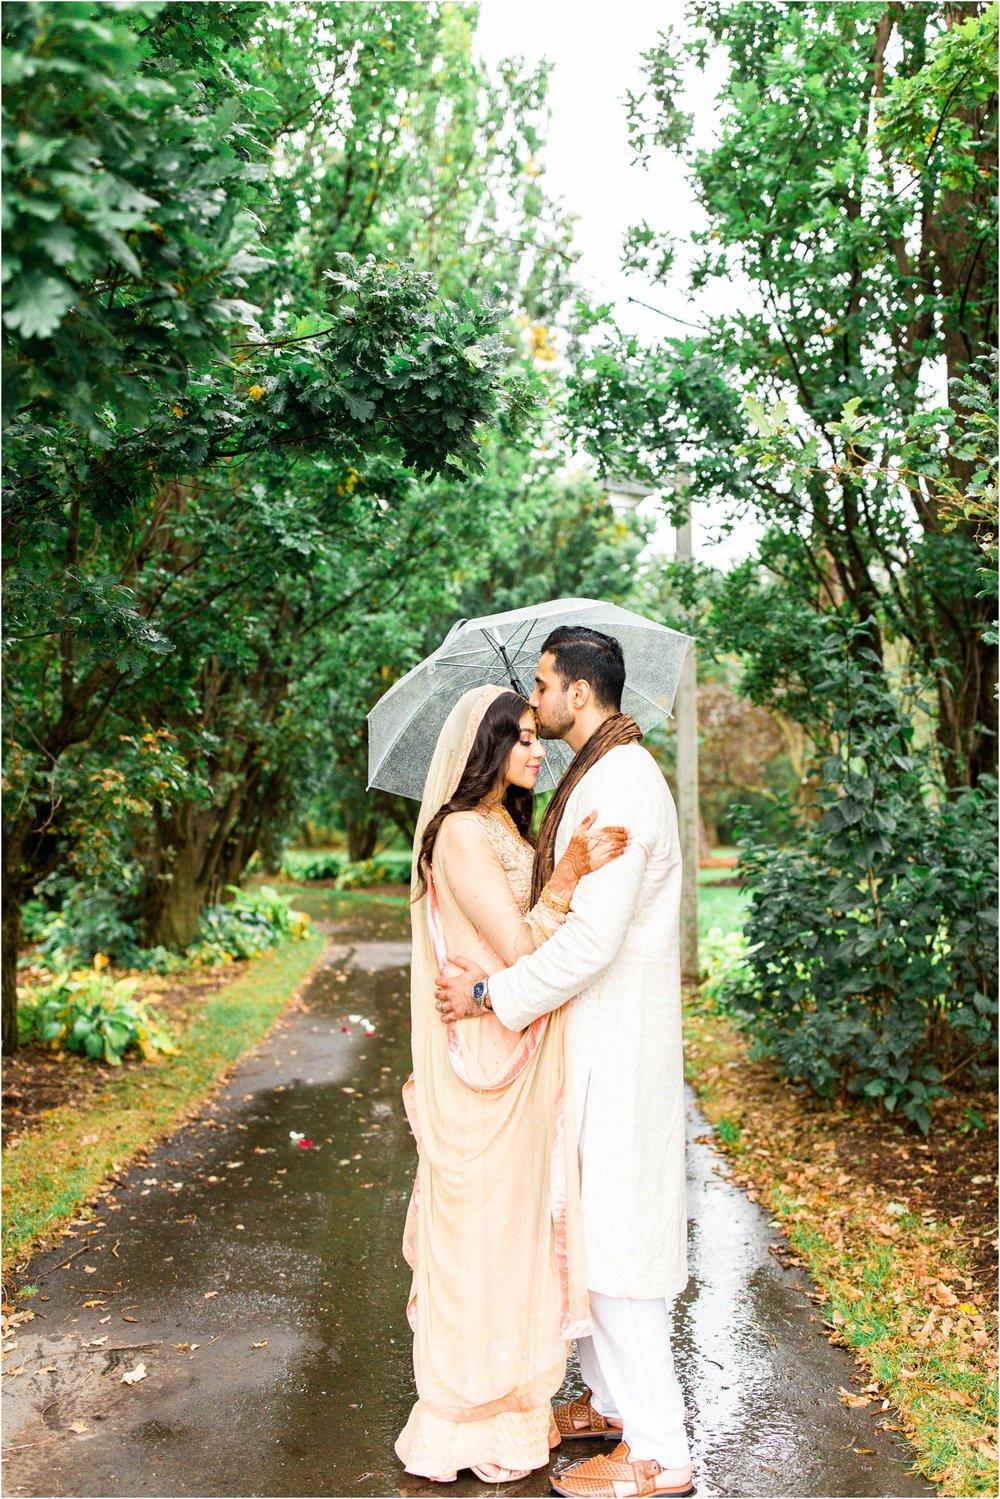 Best-of-2017-Weddings-Toronto-Mississauga-Brampton-Scarborough-GTA-Pakistani-Indian-Wedding-Engagement-Photographer-Photography_0091.jpg